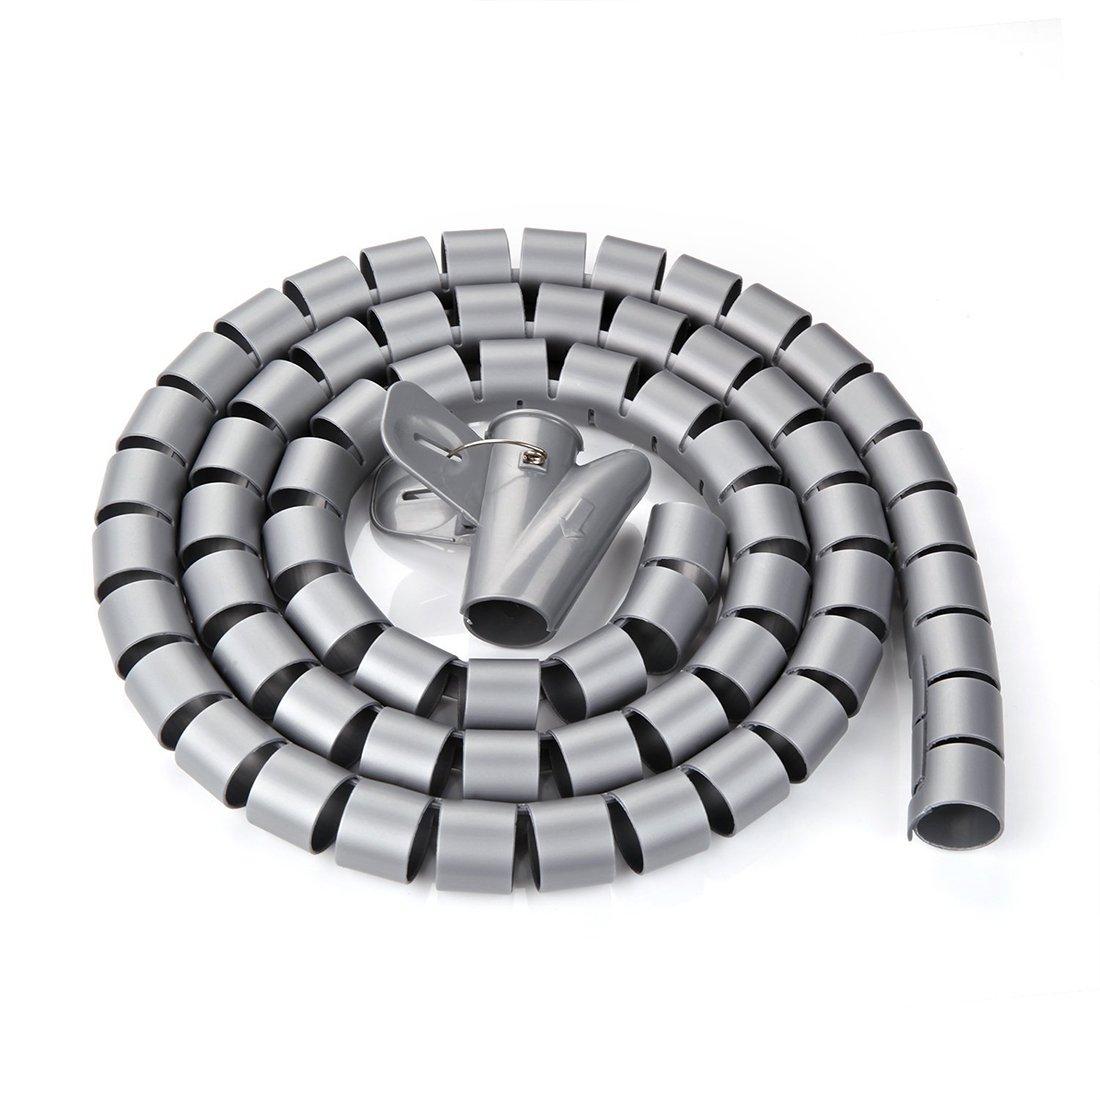 sourcingmap® Weiß 10ft 10mm Flexibel Kabelspirale Spiralband Kabelschlauch m. Klammer US-SA-AJD-264617